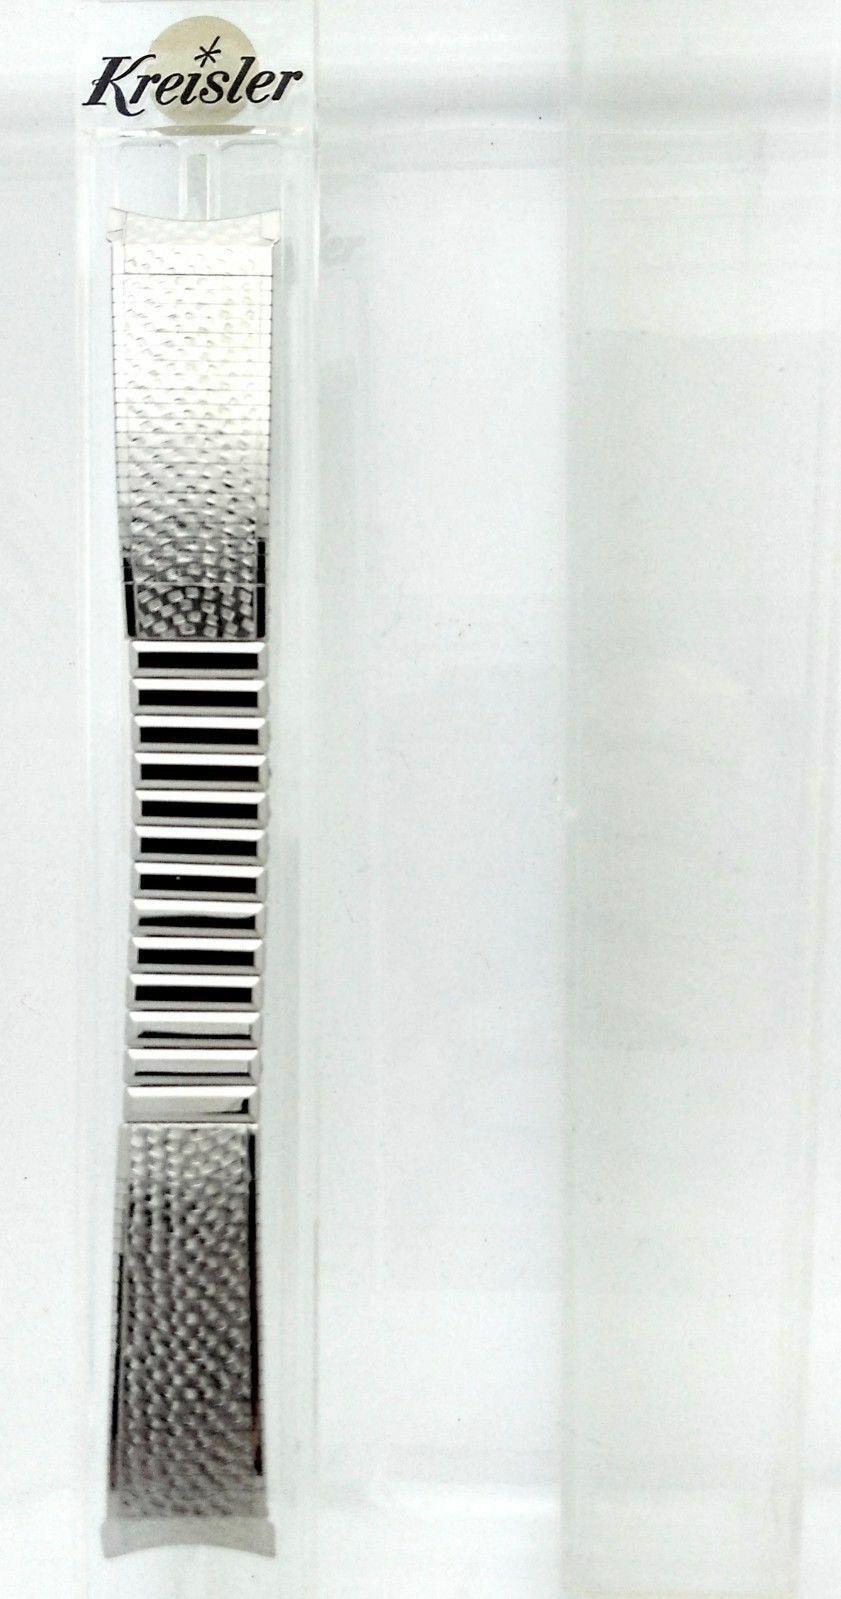 Vintage-60s-Mens-Stainless-Kreisler-18mm-NOS-Scissor-Expansion-Watch-Band-Peen-361935511638-3.jpg